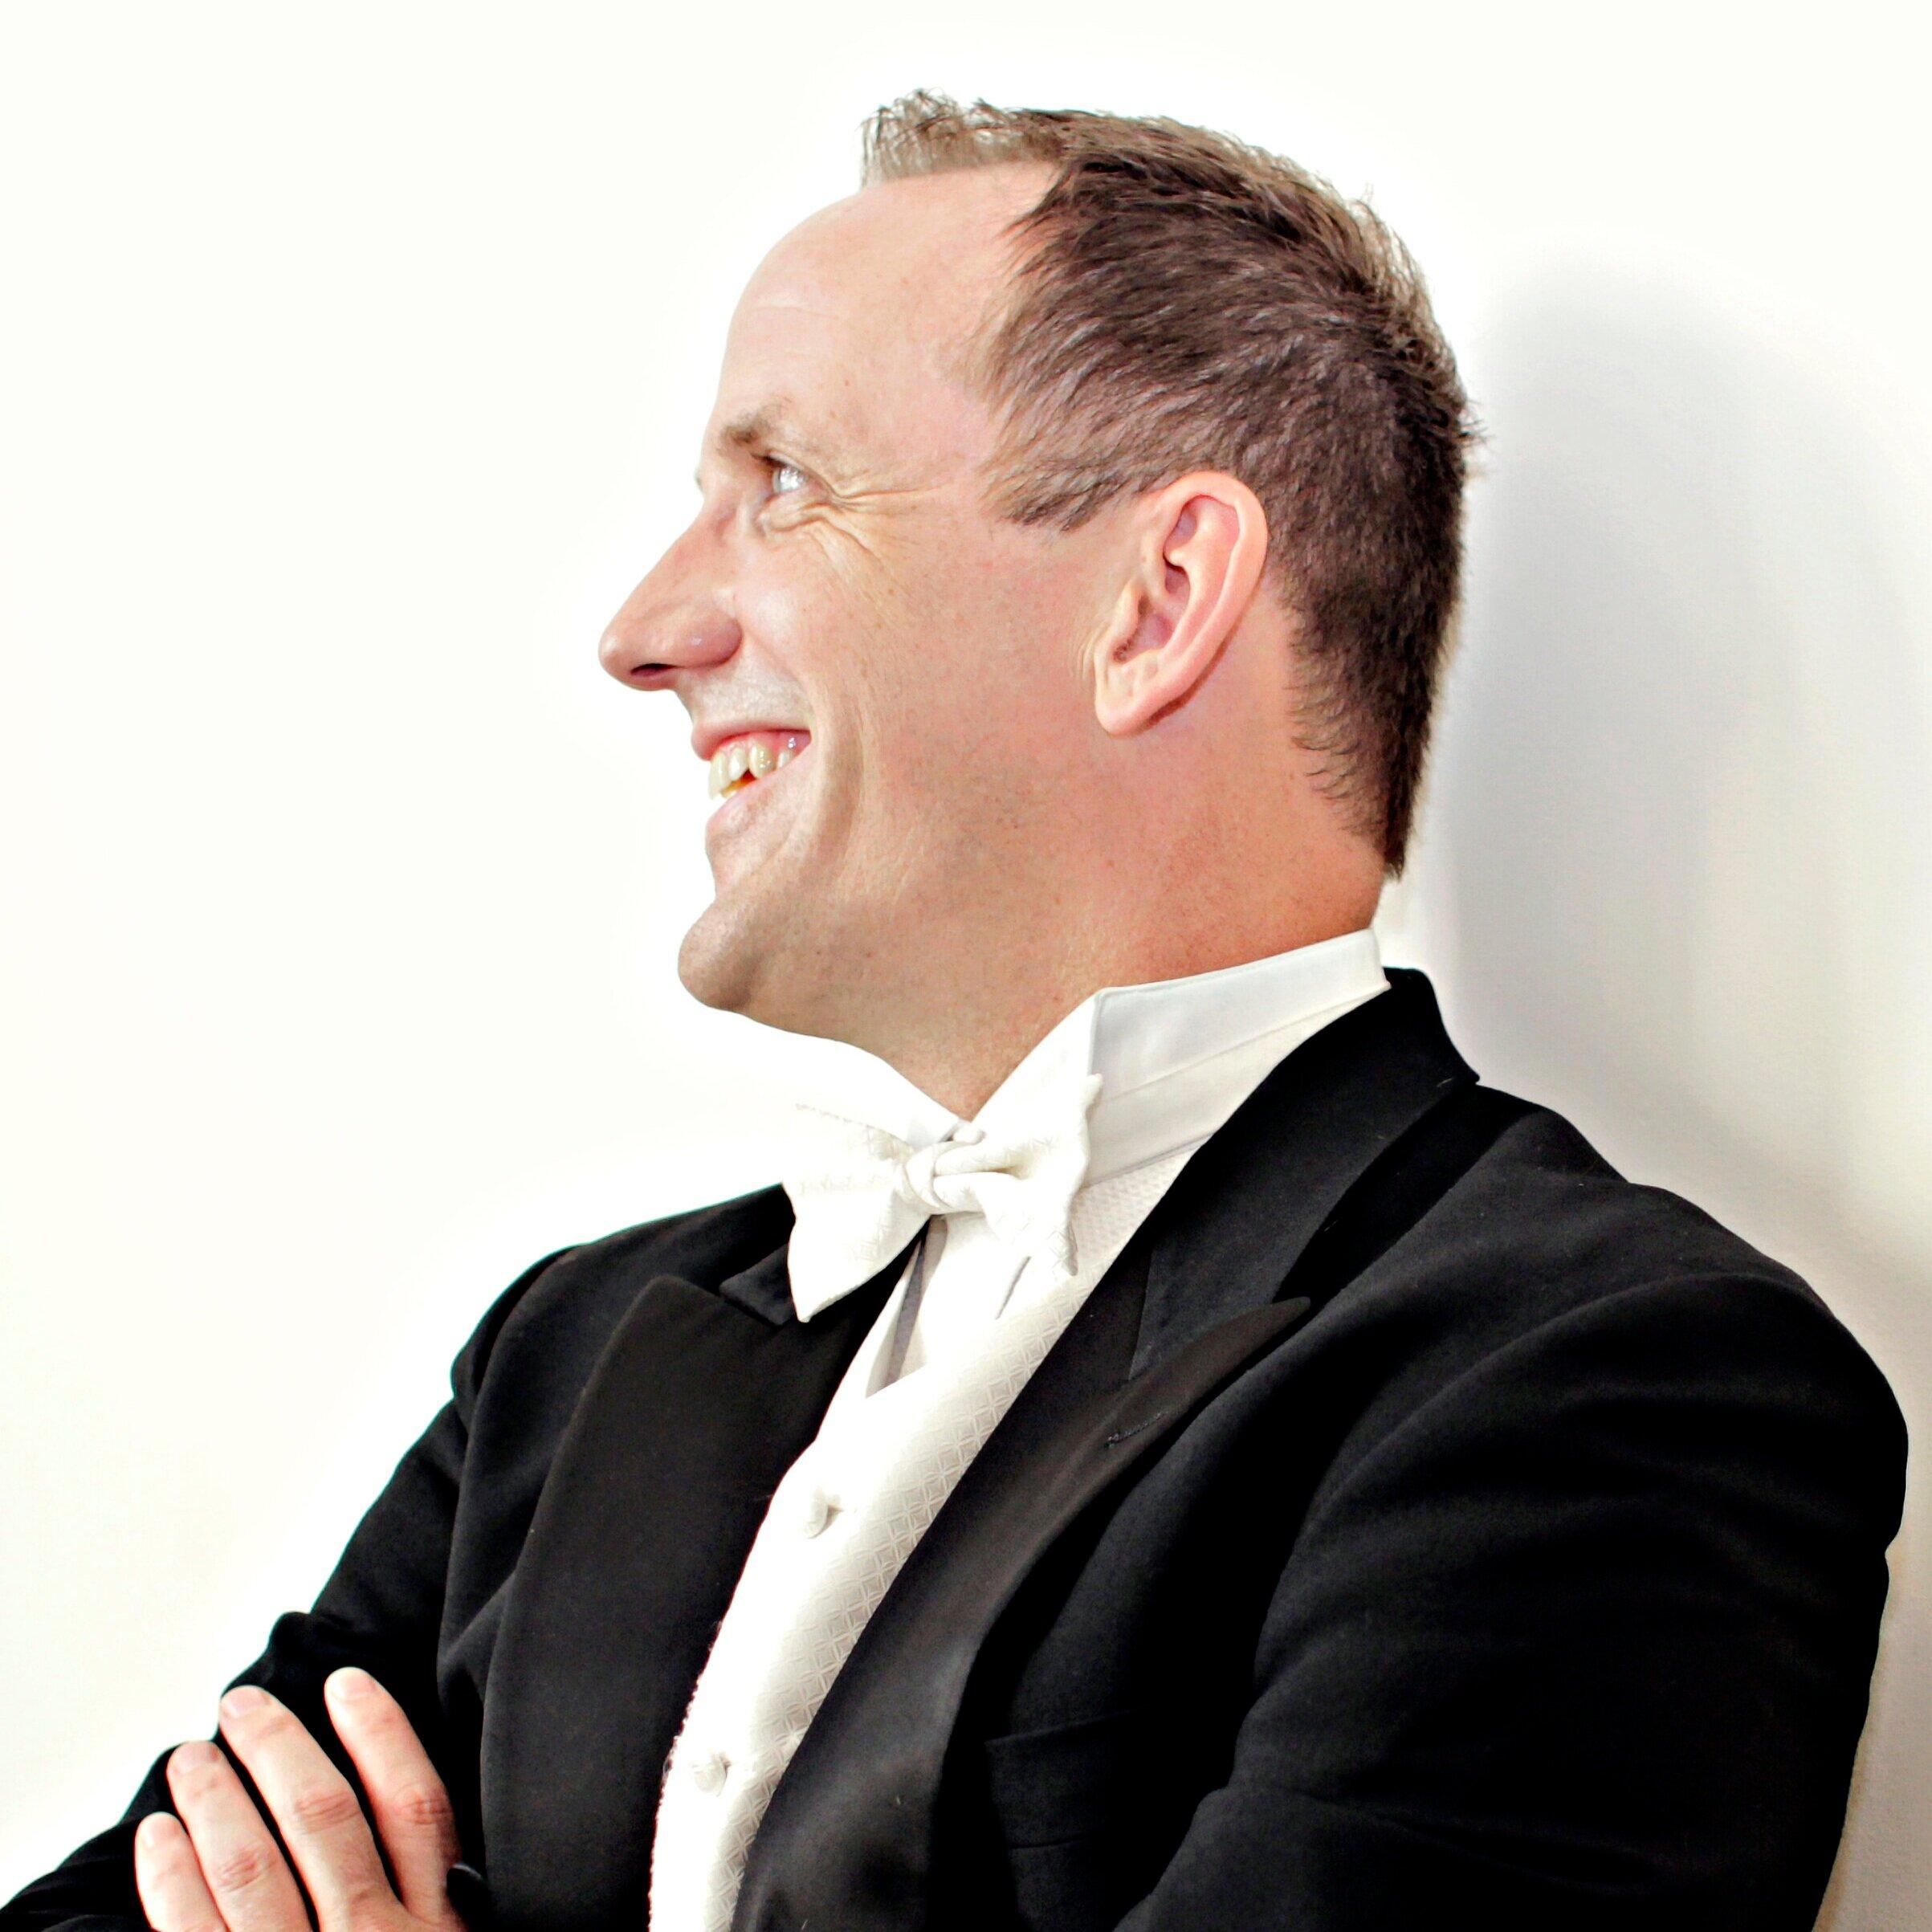 Scott Terrell, Conductor